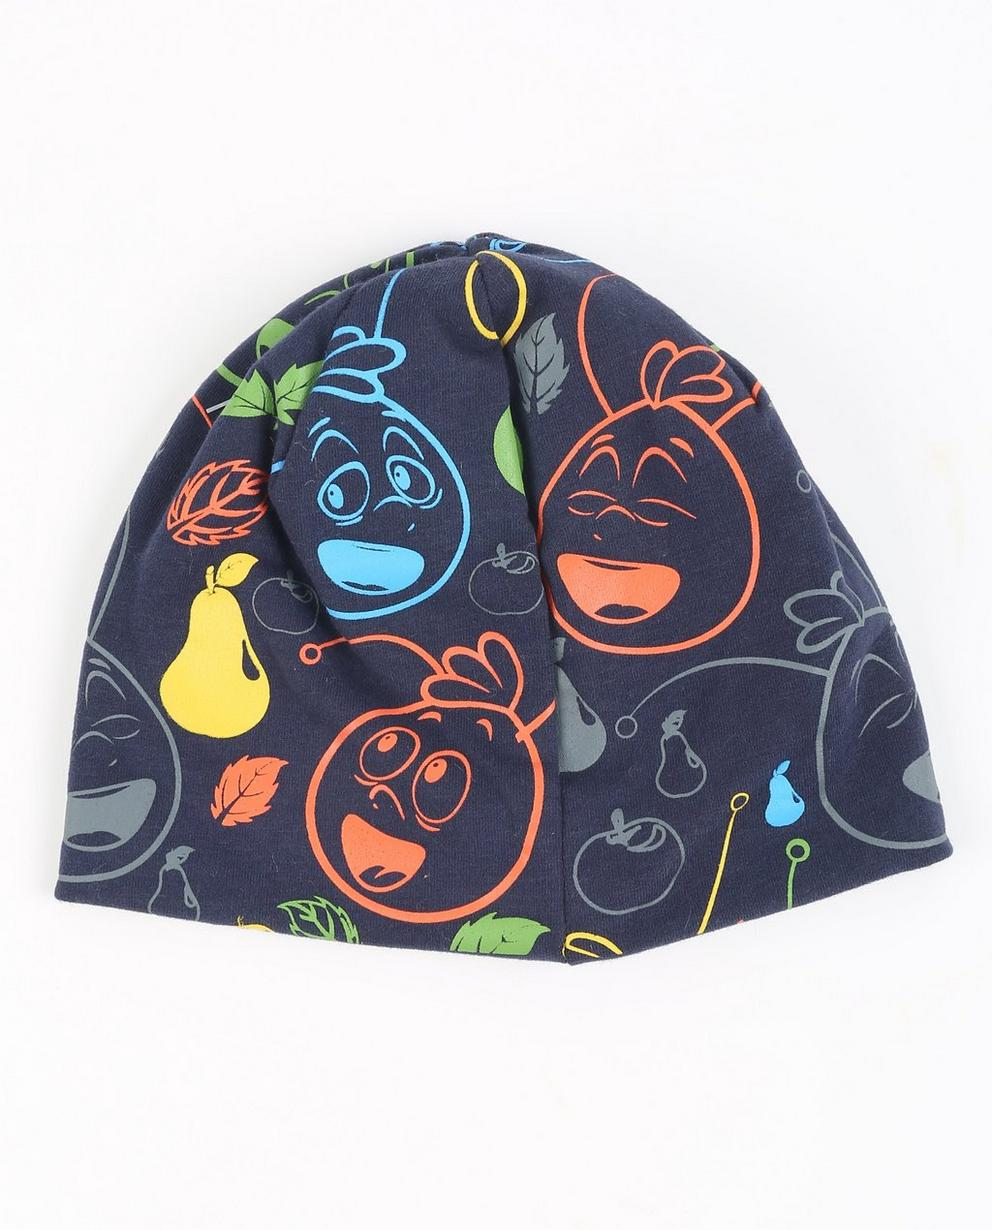 Dunkelblaue Mütze - mit buntem Print - Maya